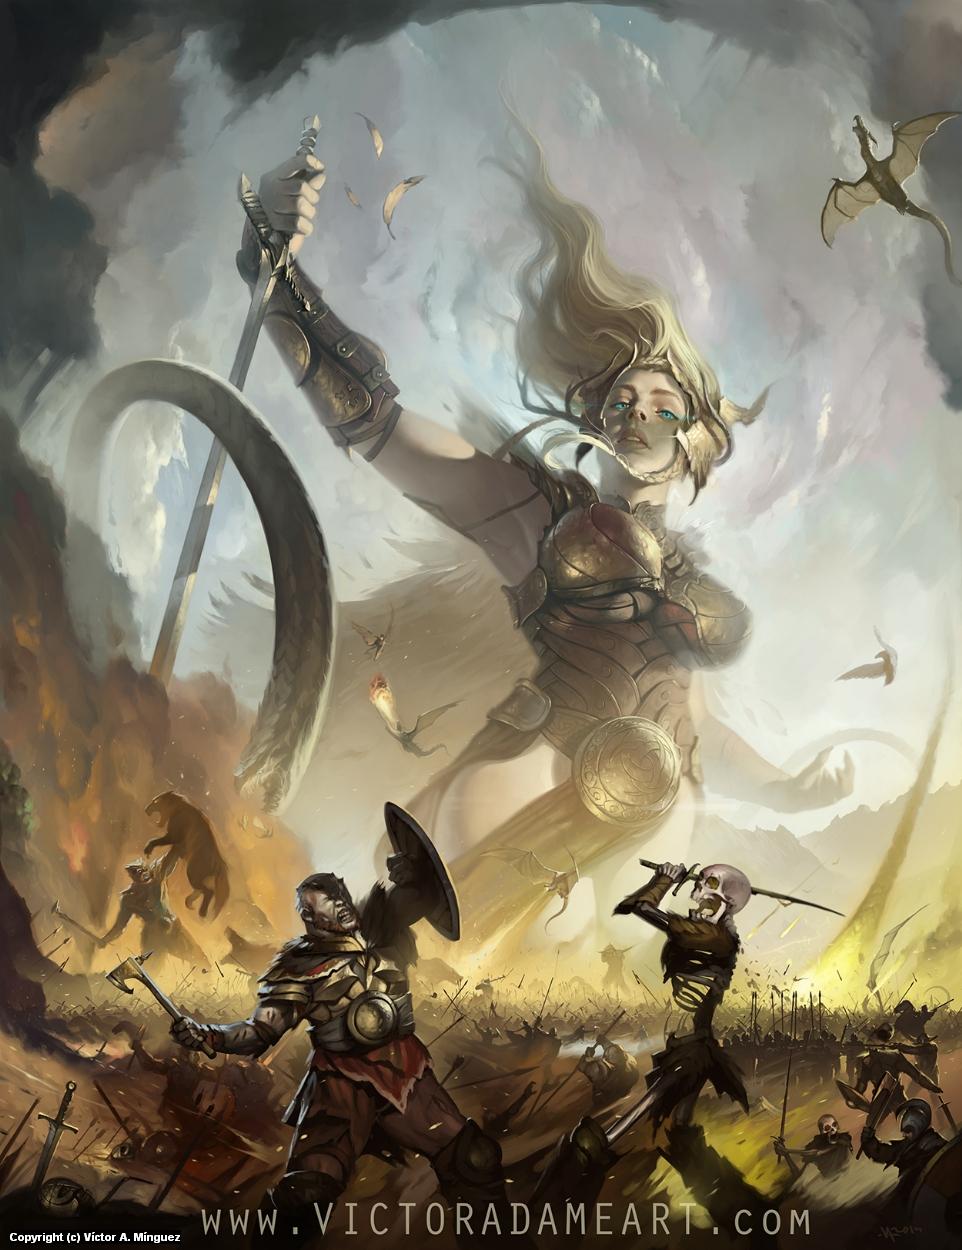 Avatar of War Artwork by Victor Adame